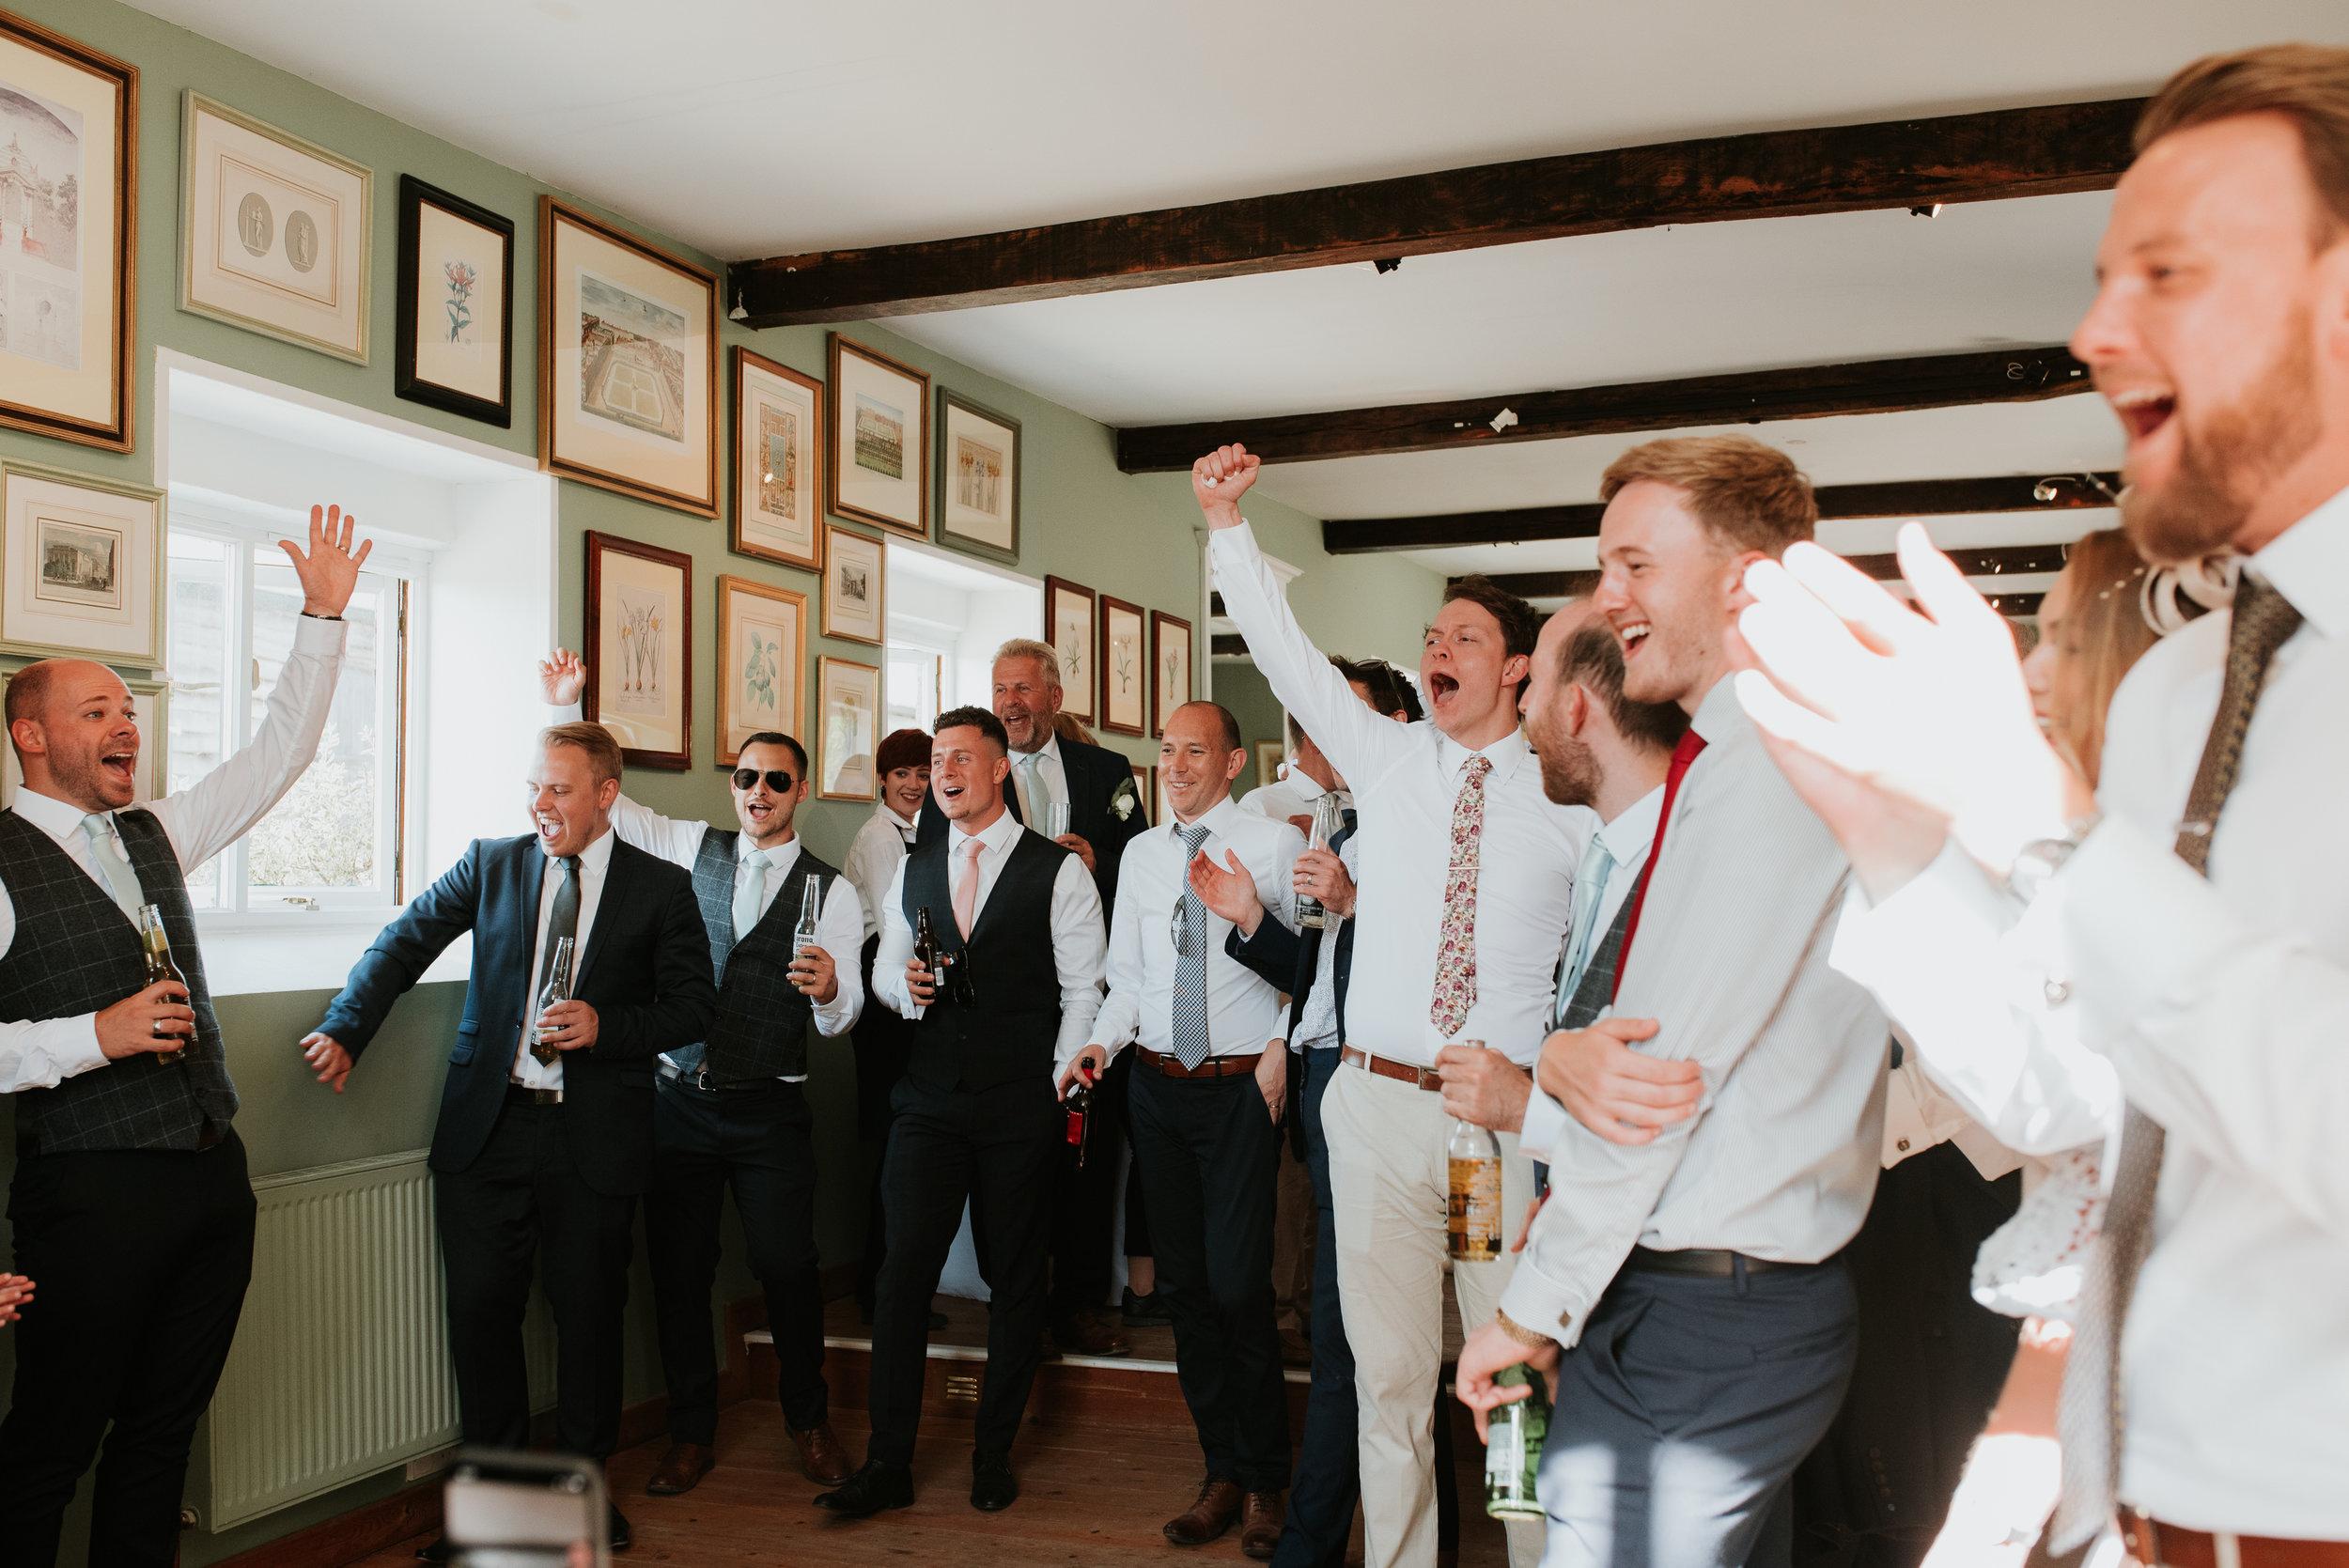 Oxfordshire-wedding-photographer-57.jpg